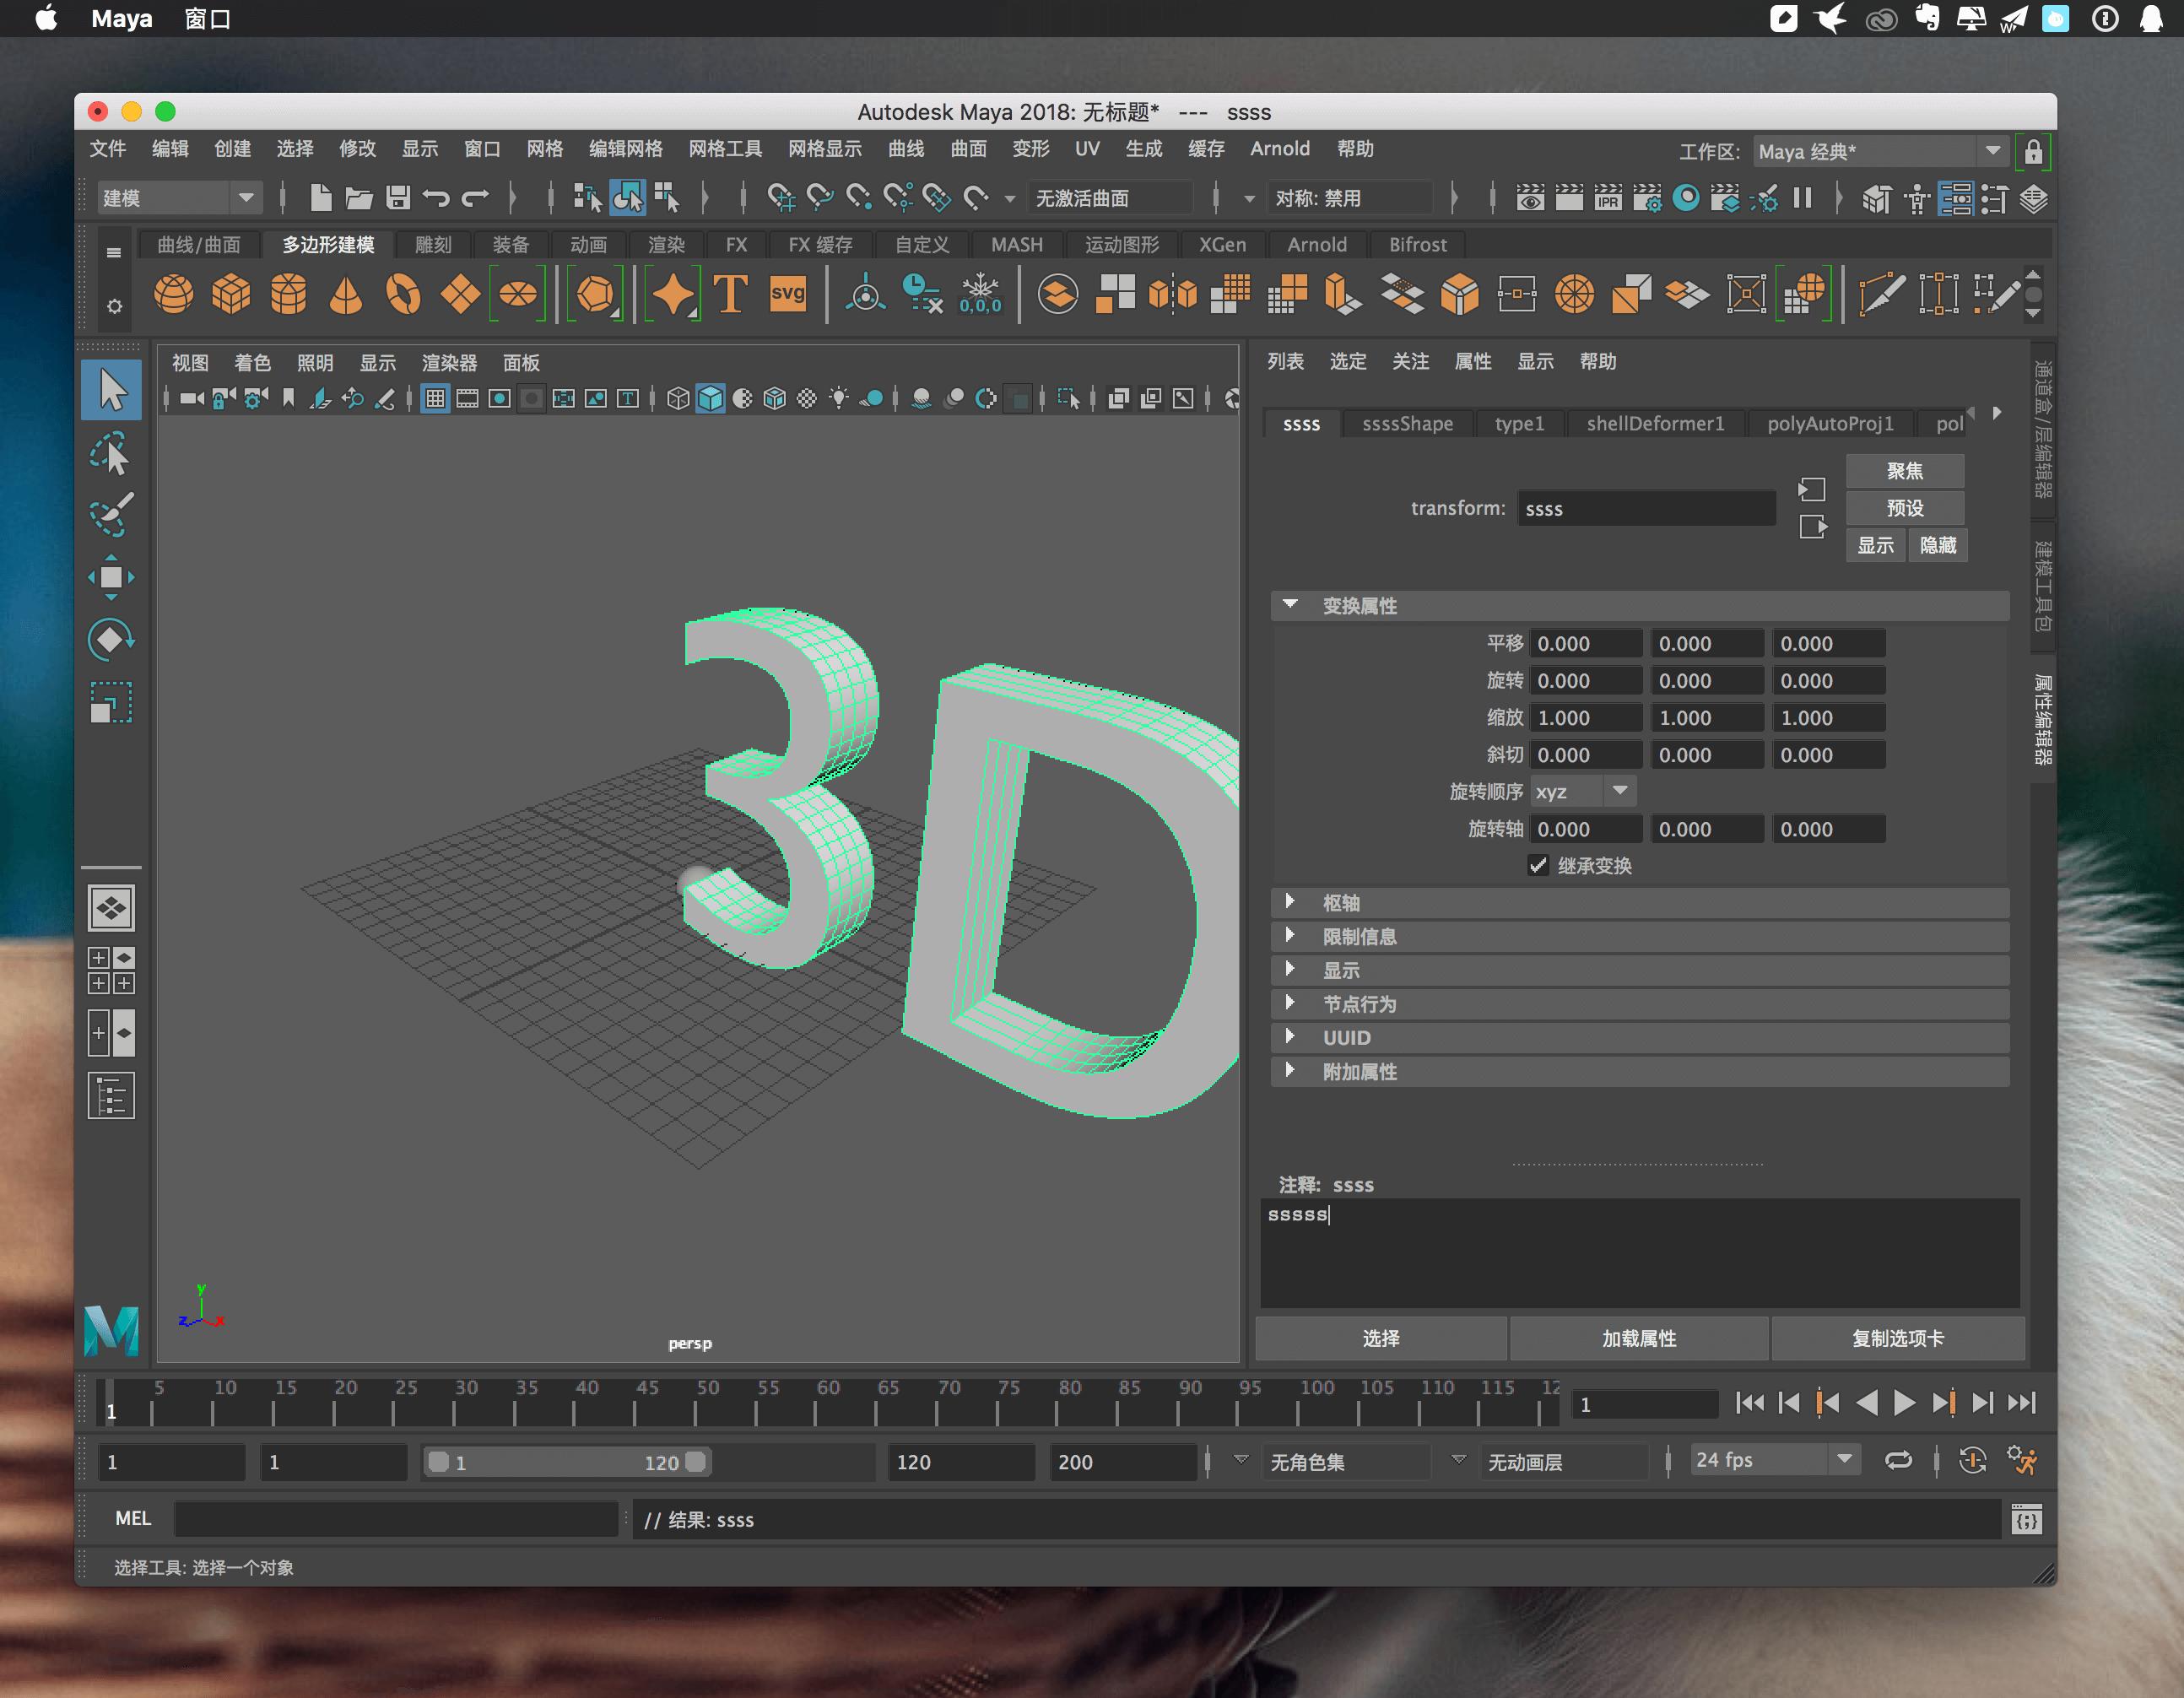 Autodesk Maya for mac 2019.2中文版